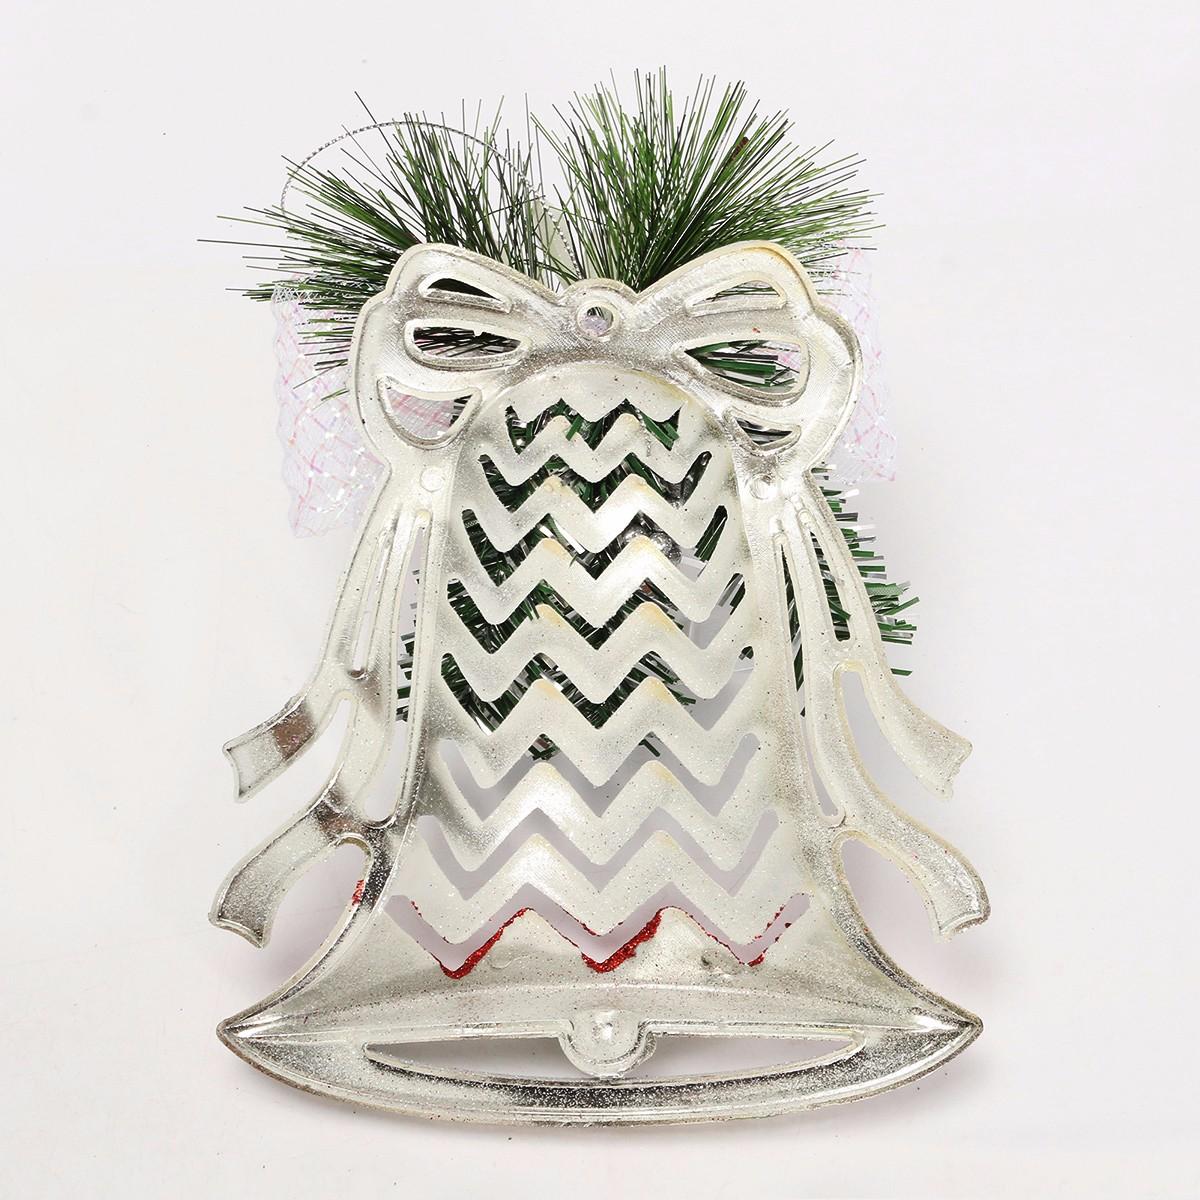 White Christmas Tree Decorations Australia: Plastic Christmas Tree Ornaments White Christmas